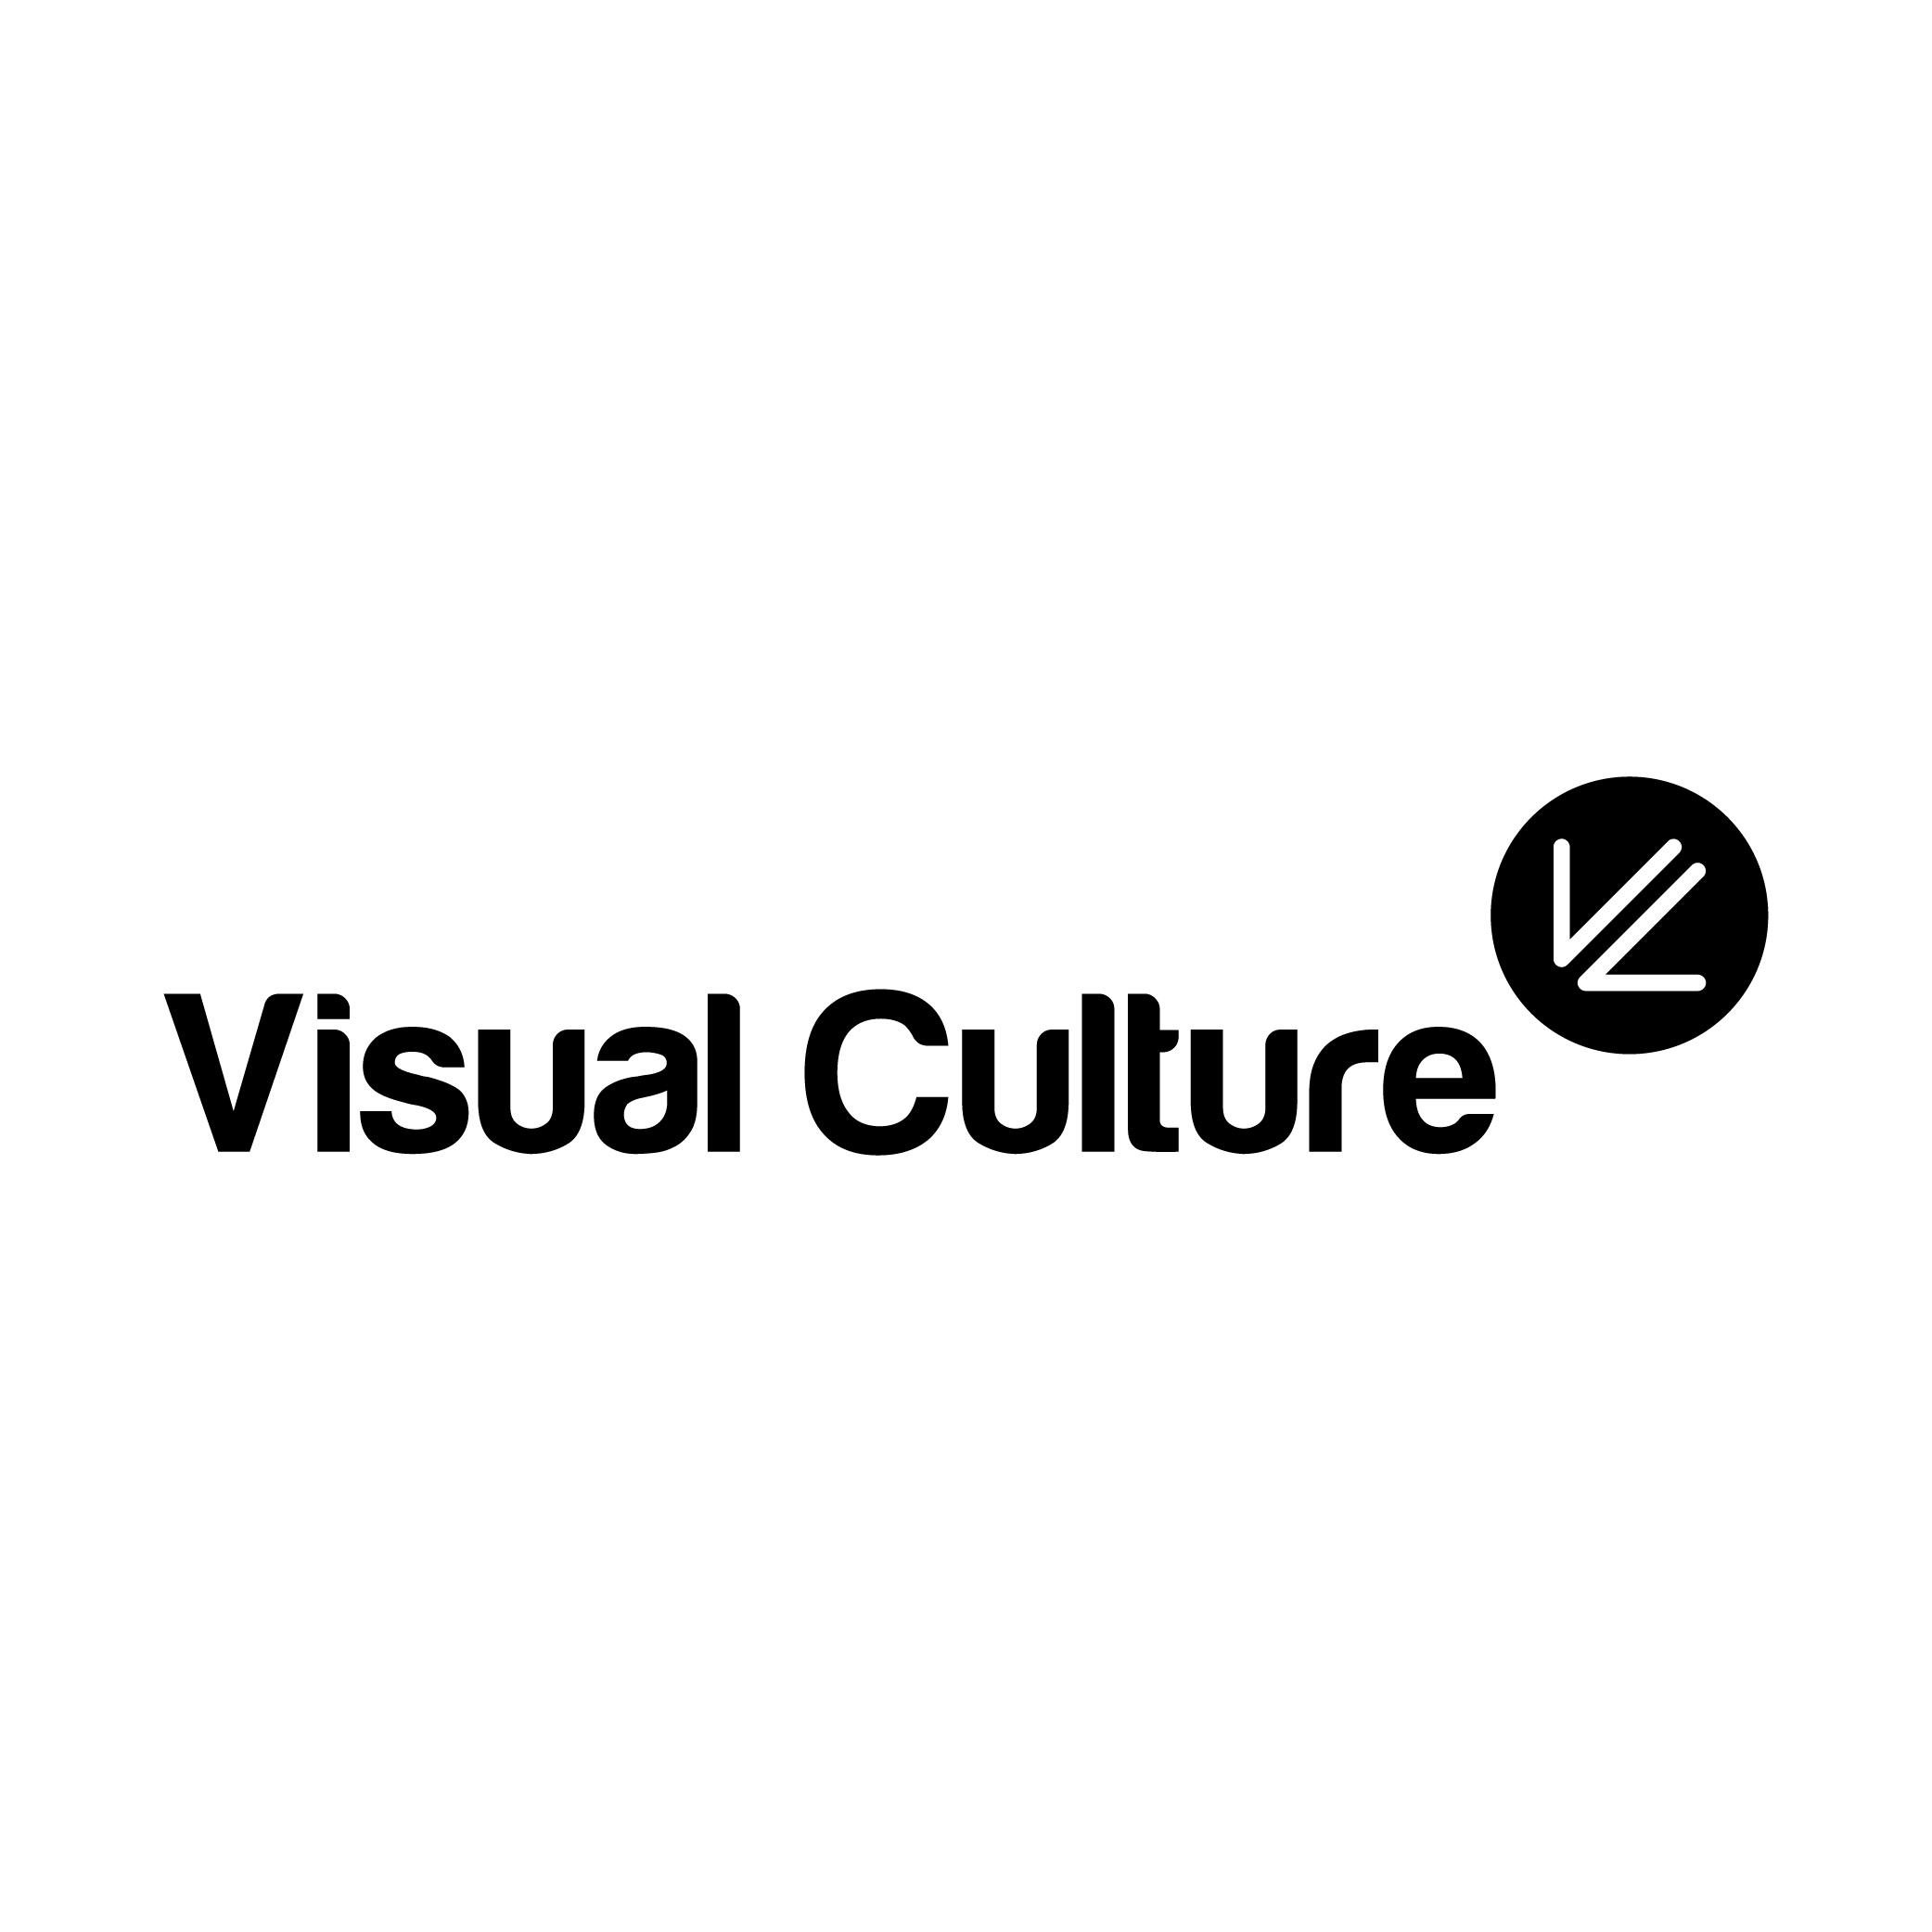 Visual Culture